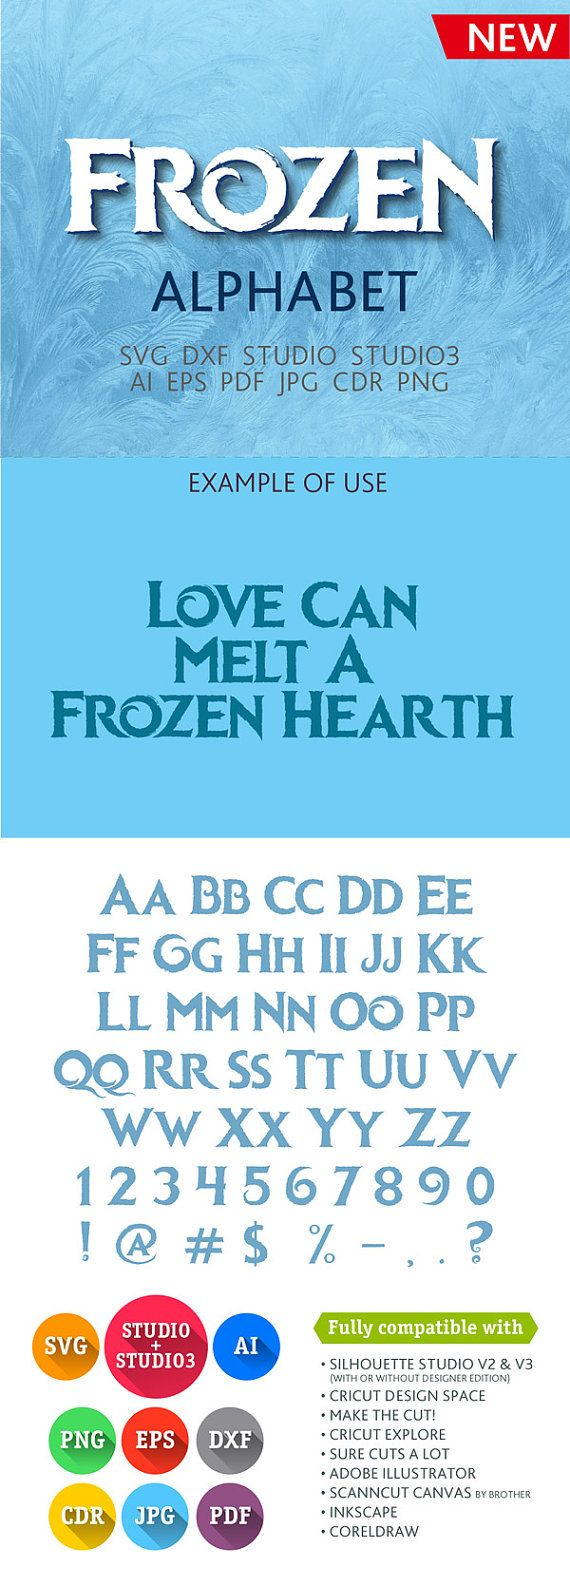 Frozen Font Alphabet Cuttable SVG DXF EPS Studio Studio3 Png Pdf Jpg Ai Cdr  files for Silhouette Studio, Cricut, Cameo